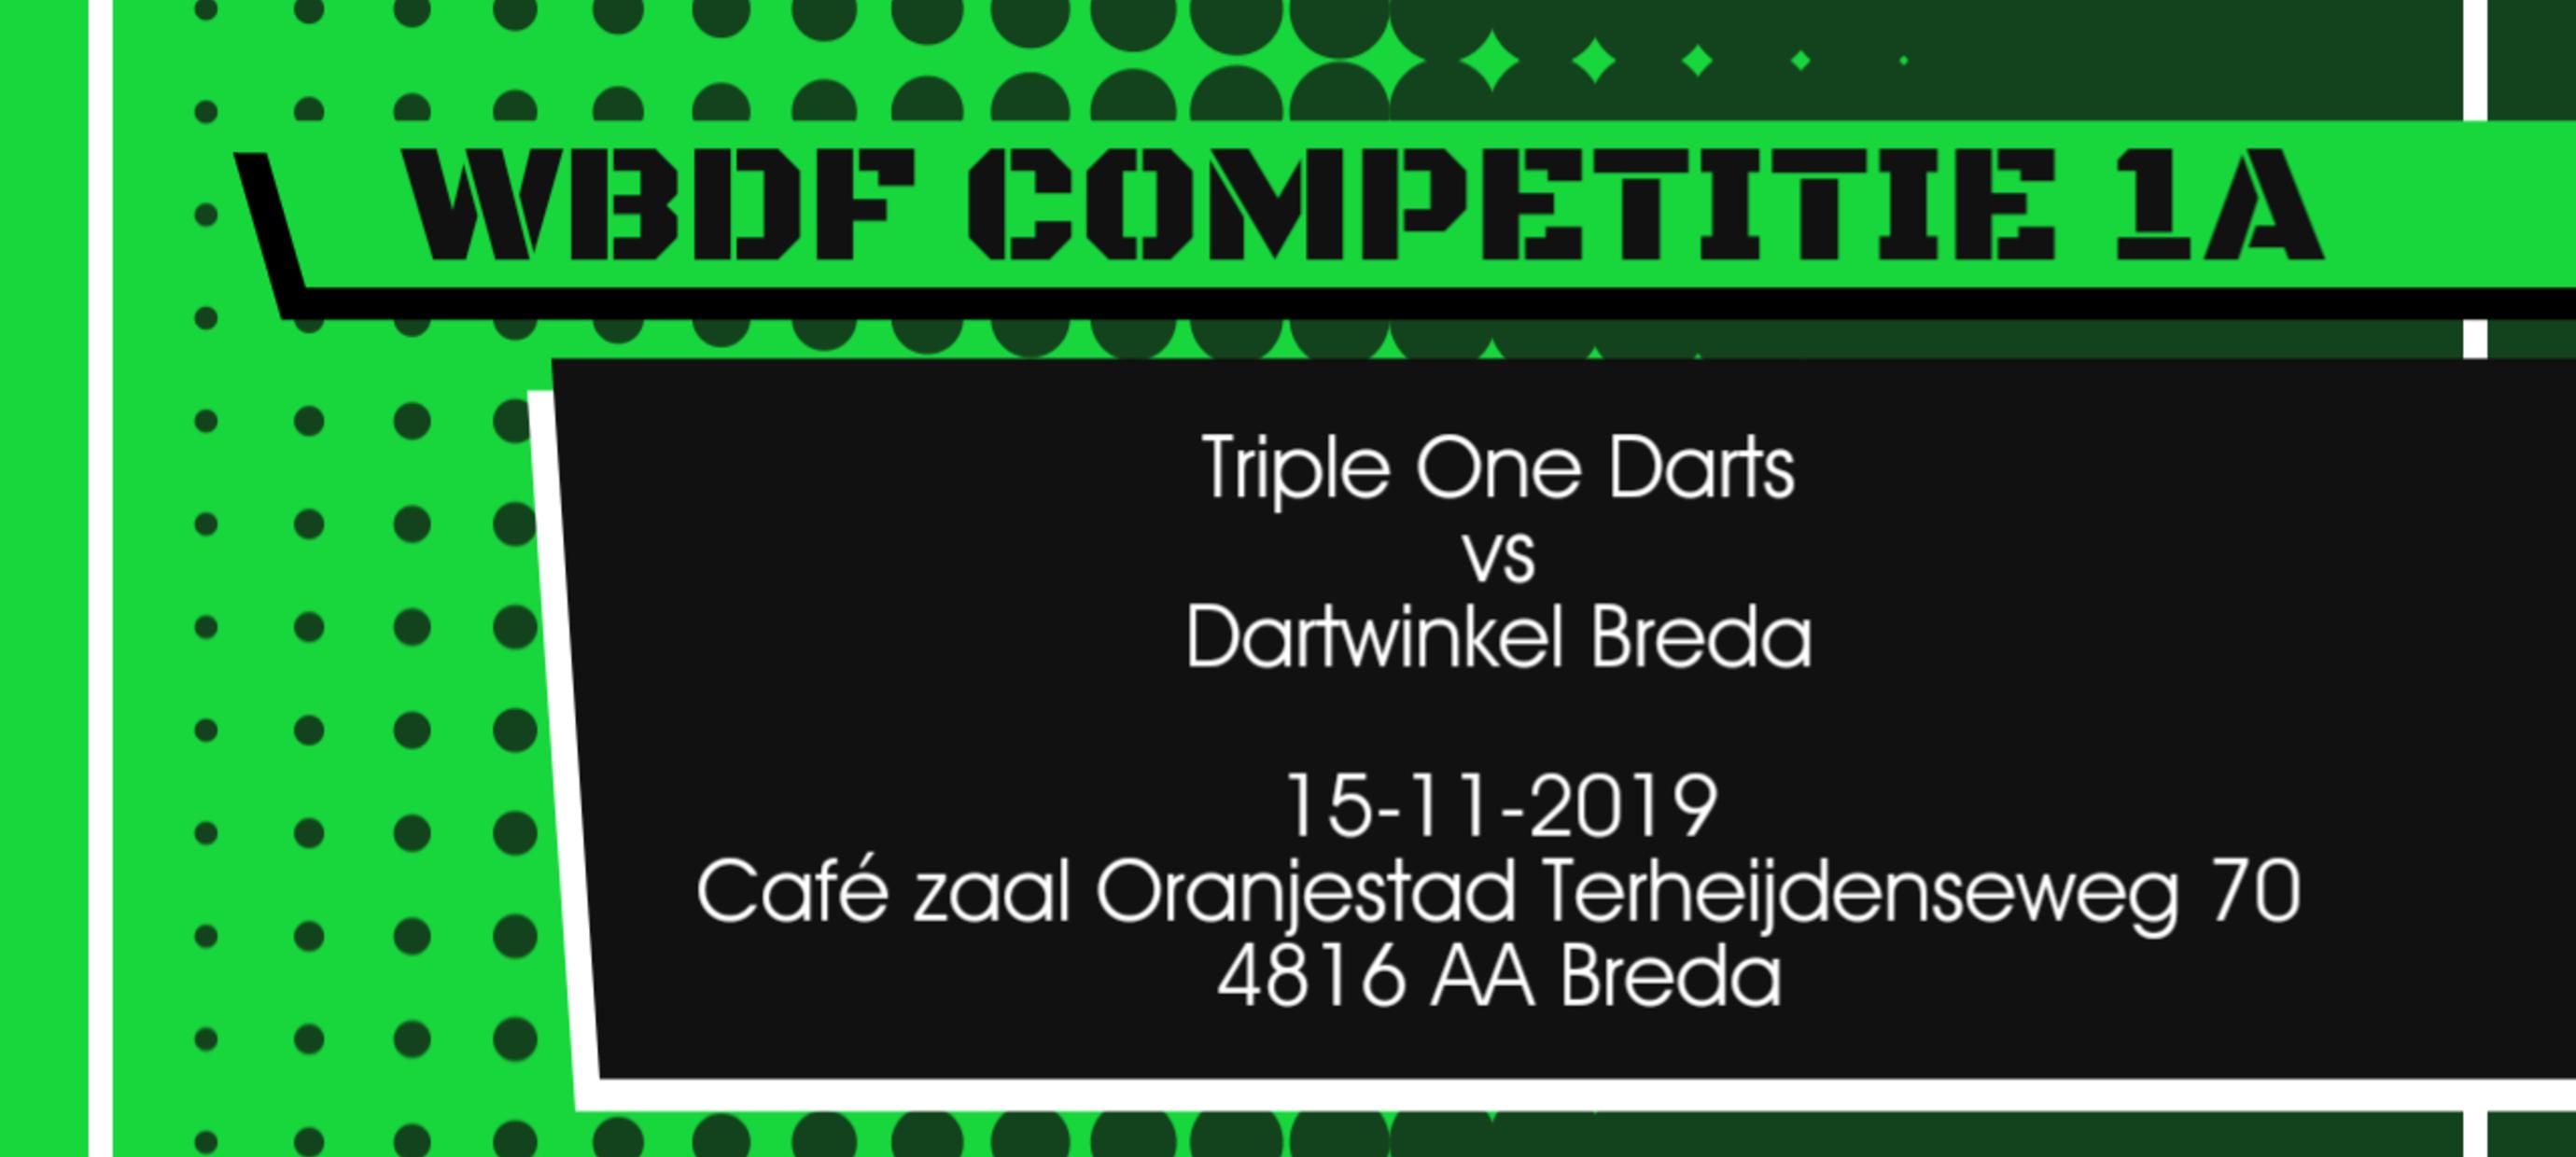 Team Triple One Darts vs Dartwinkel Breda